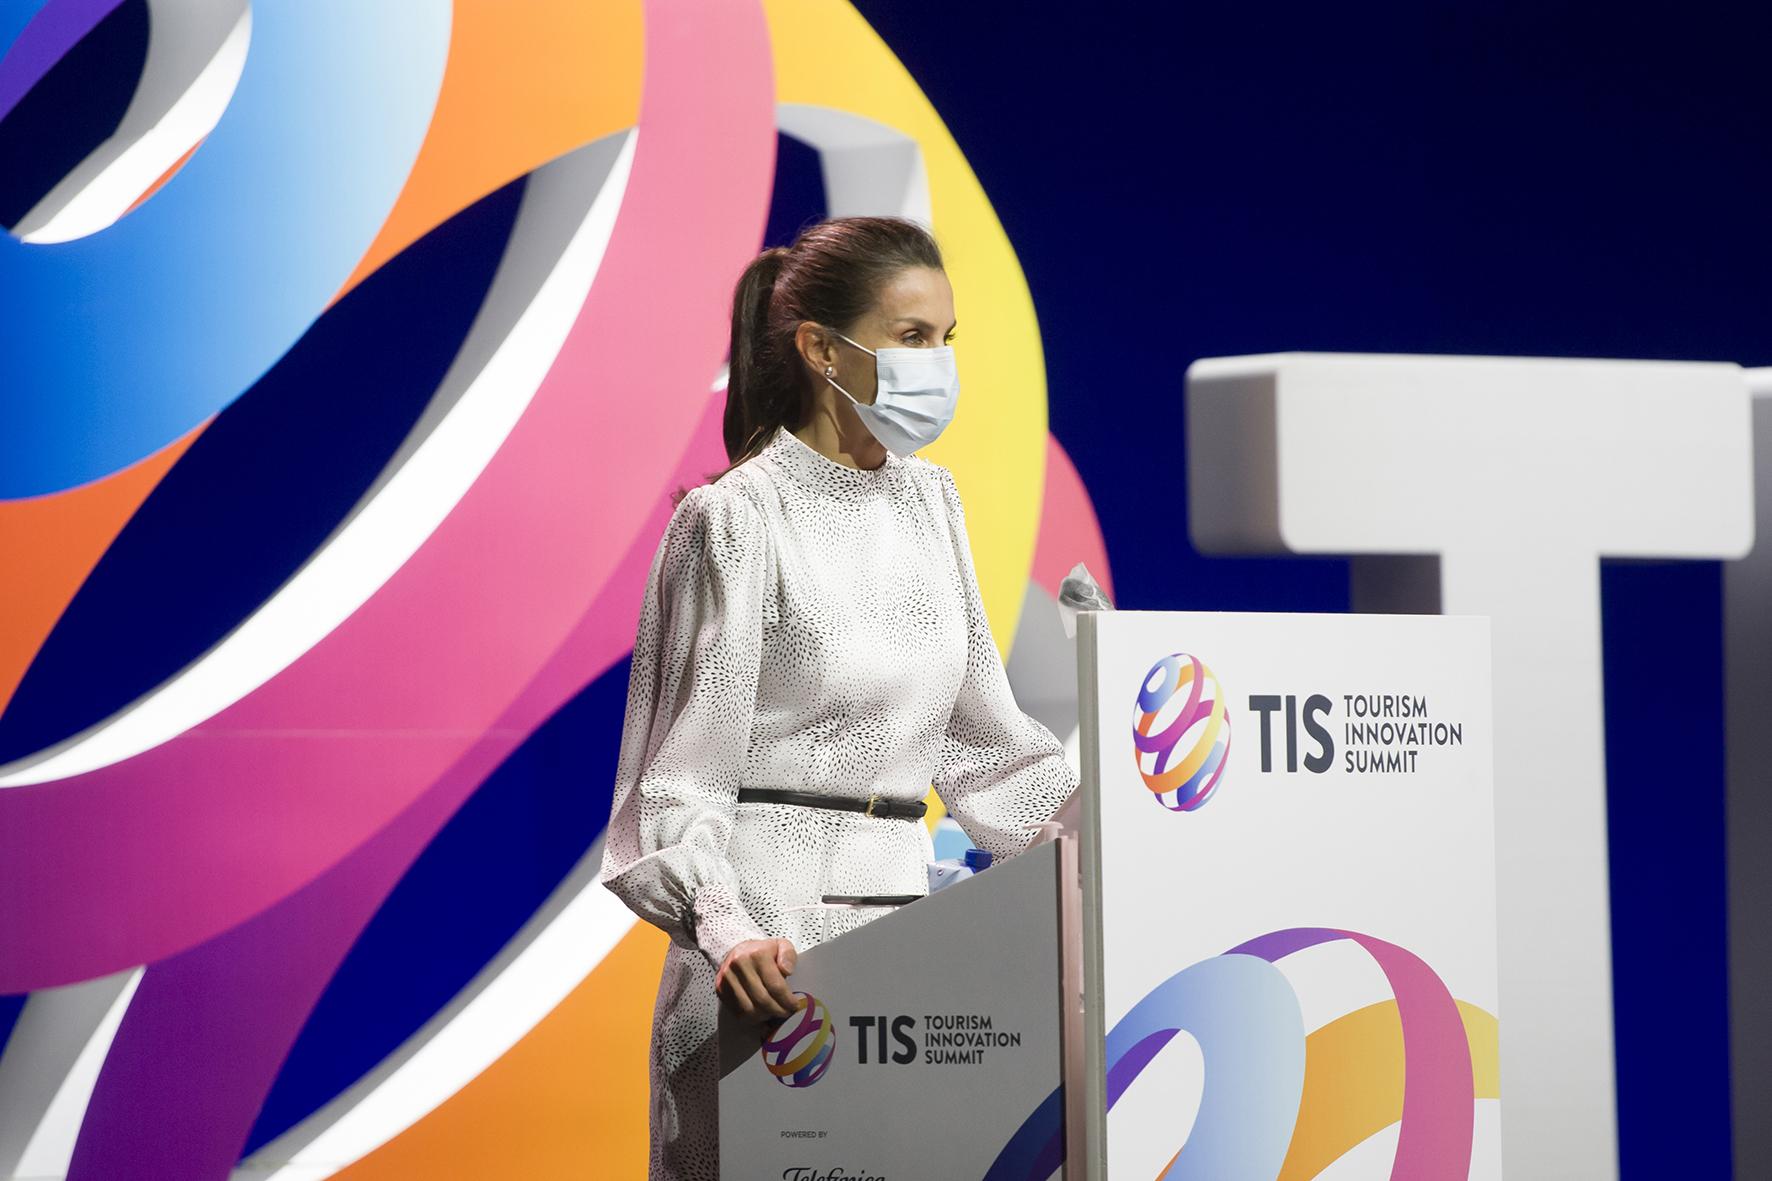 Su Majestad la Reina inaugura la primera edición de TIS – Tourism Innovation Summit